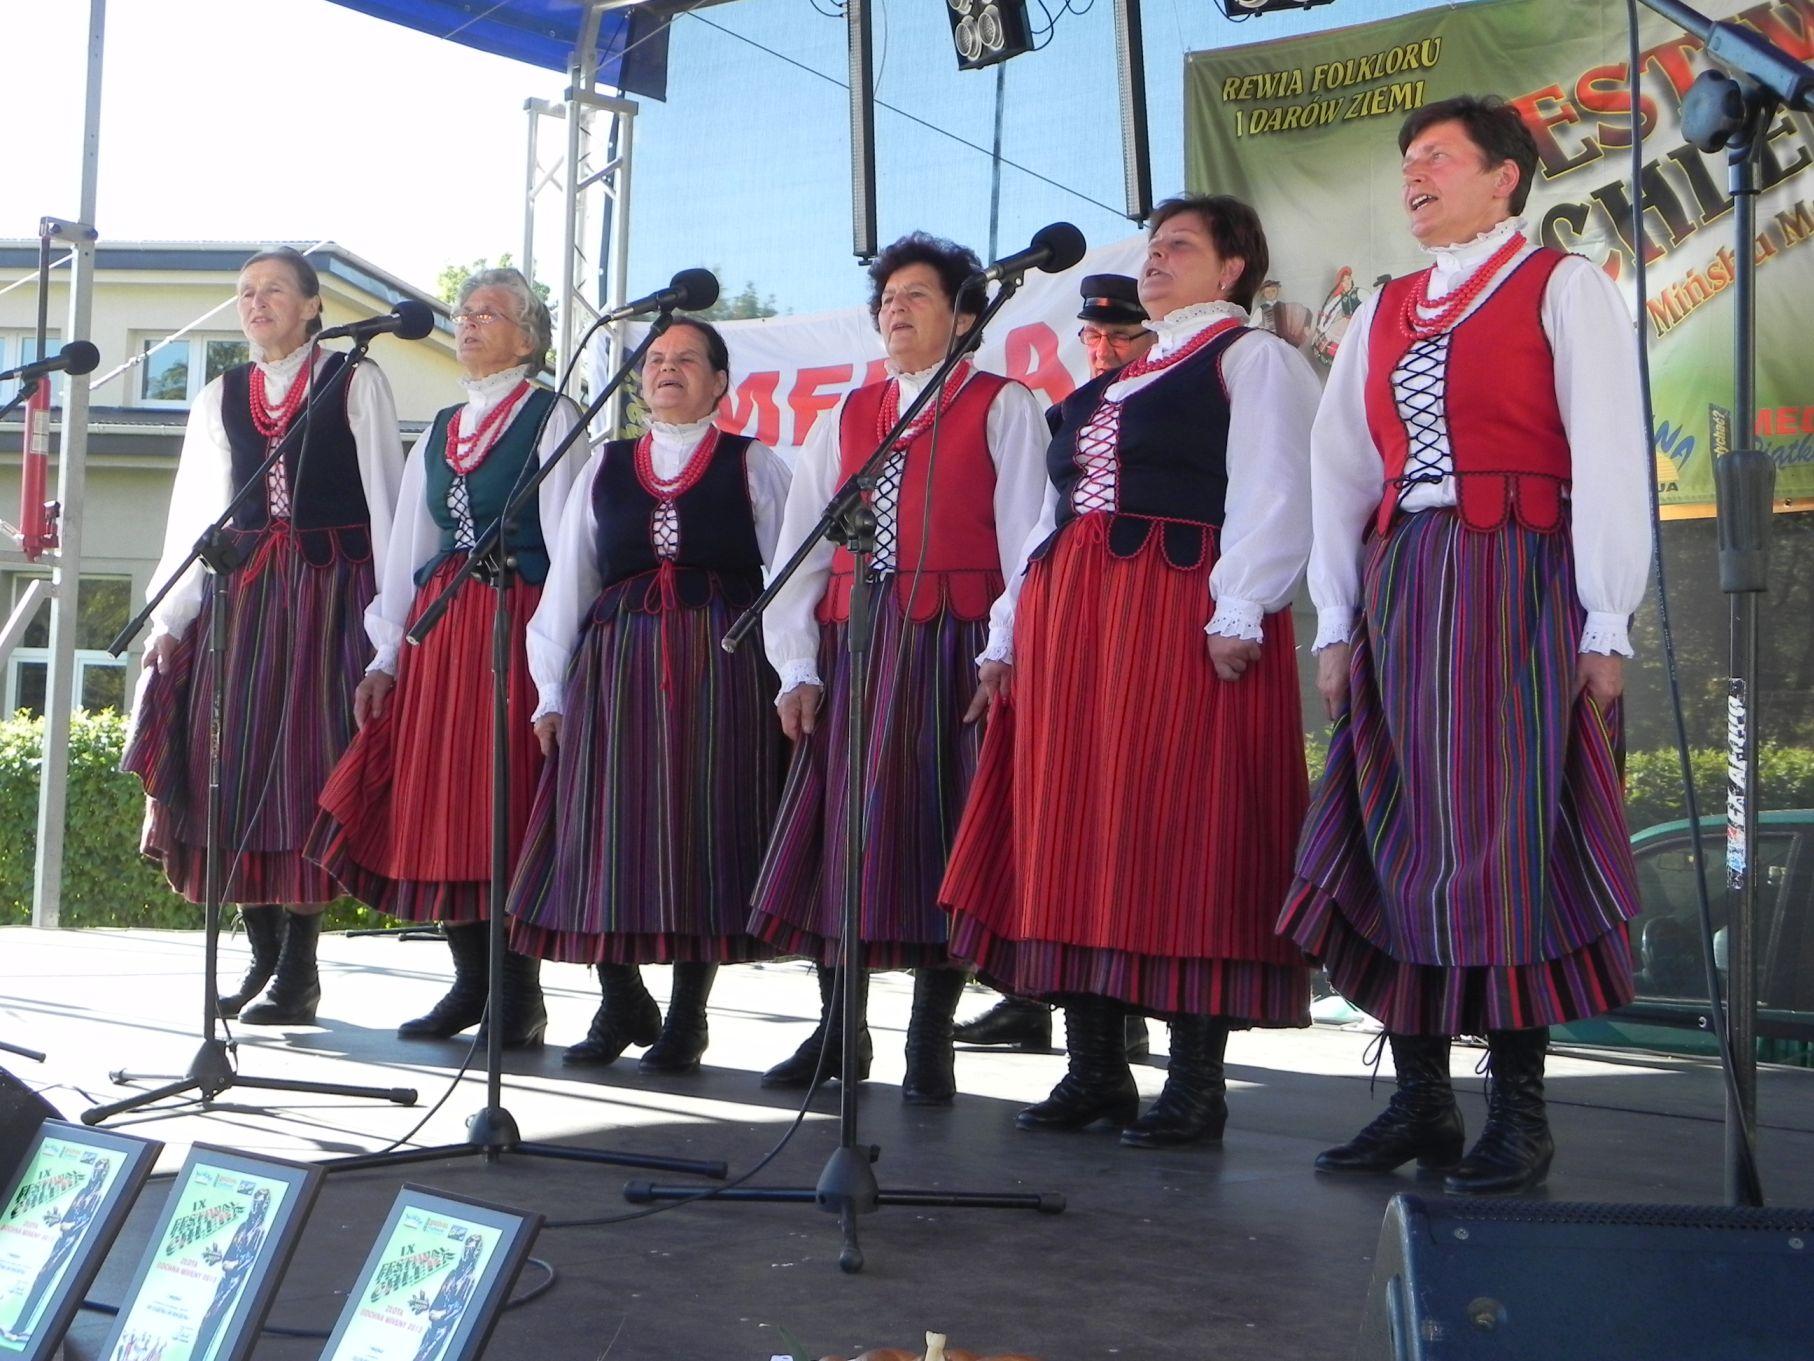 2013-09-10 Festyn - Mińsk Maz (53)